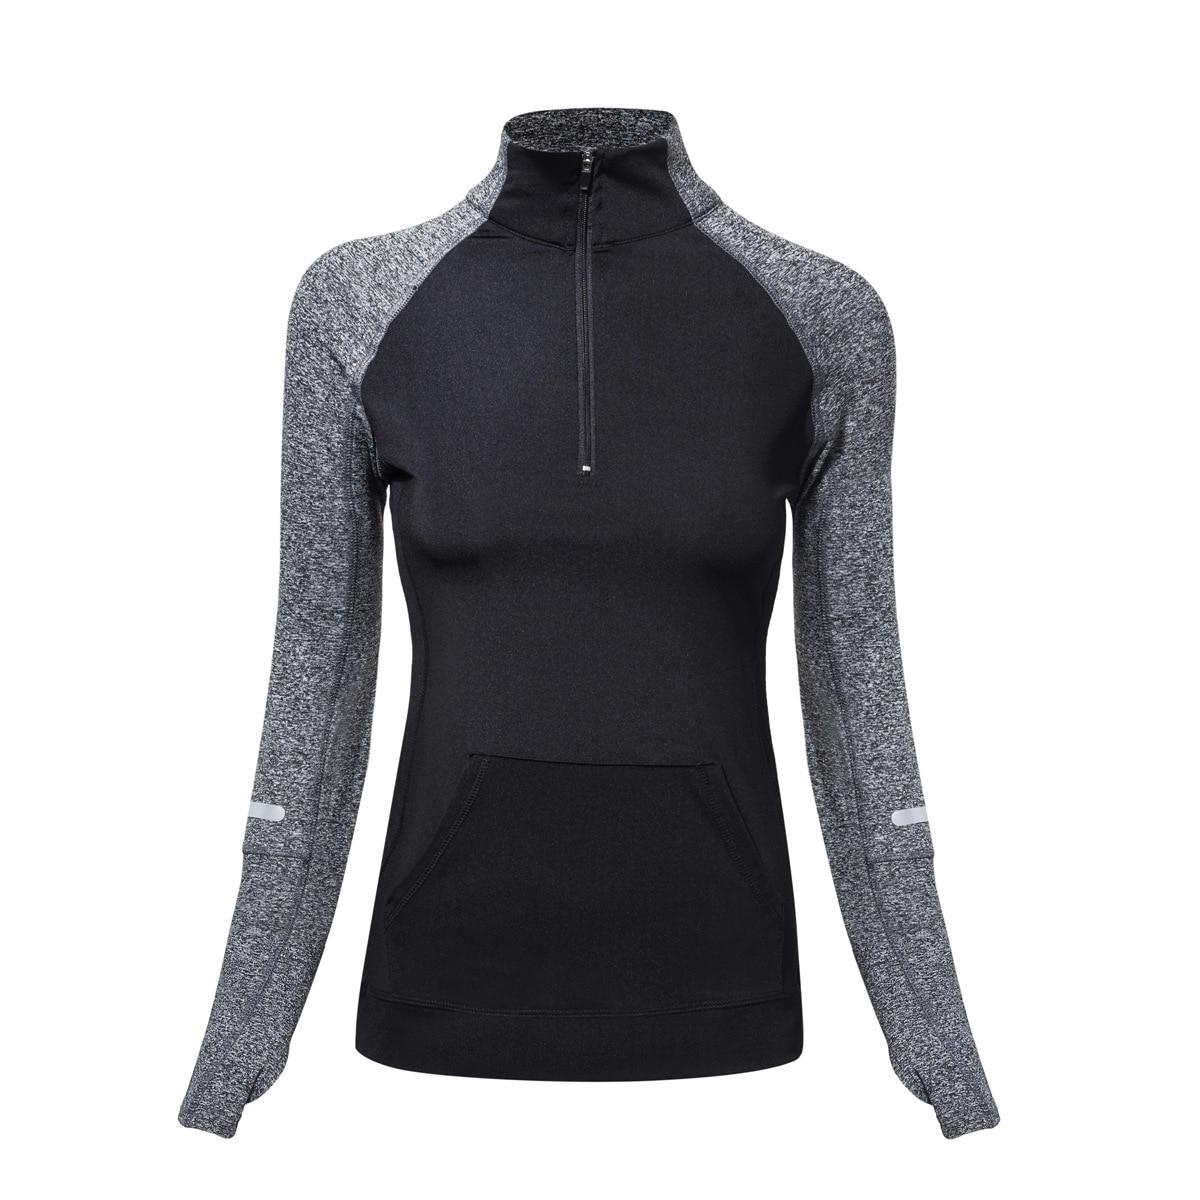 2018 New Women Sport Jacket Quick-dry Long-sleeved Running Gym Sweatshirt Cloth Fitness Zipper Jacket Outerwear Chaquetas